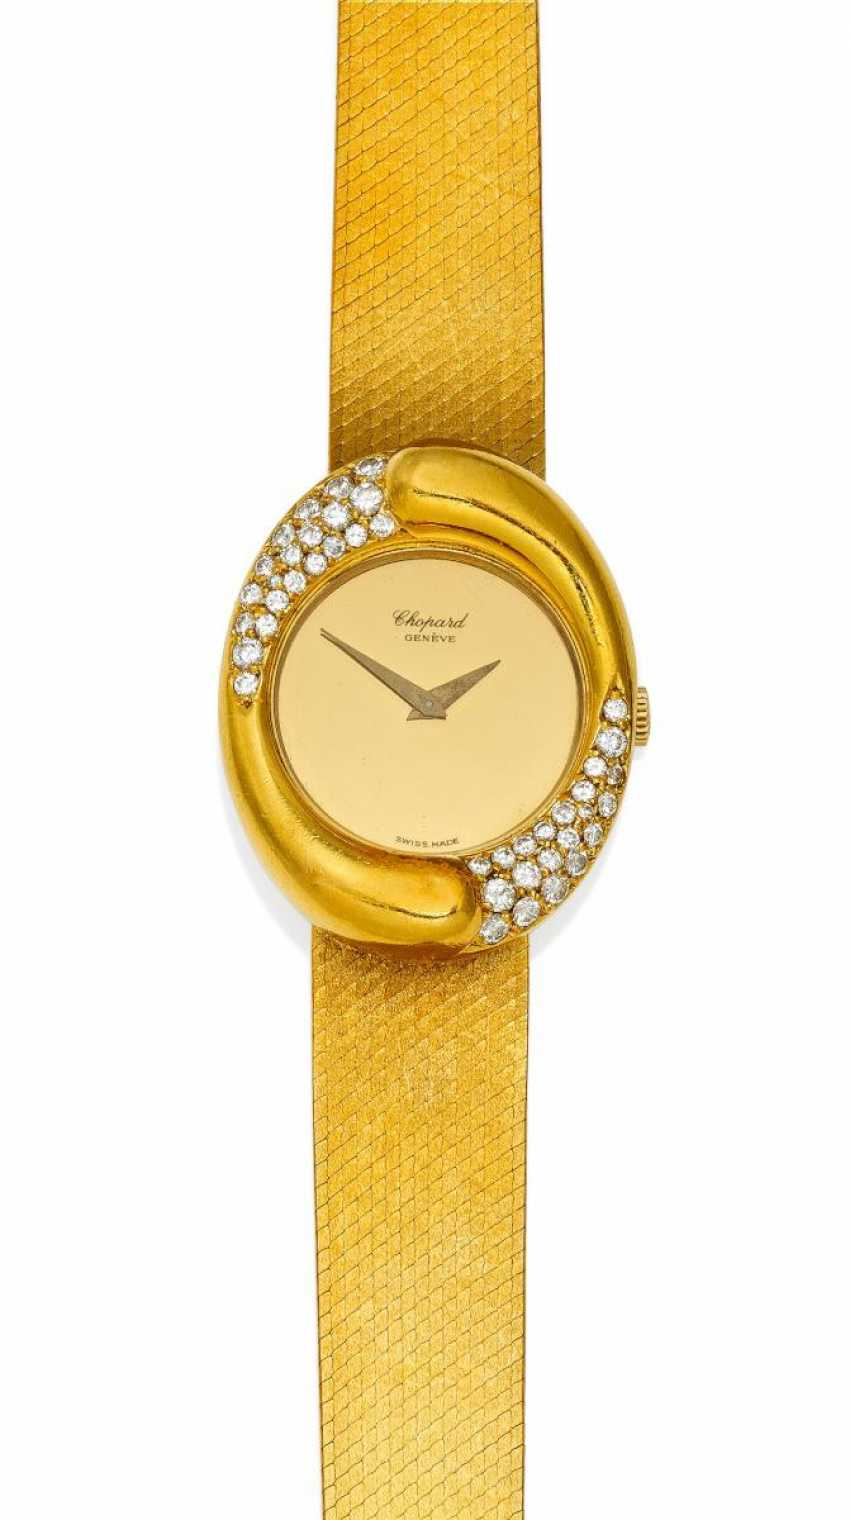 Wrist Watch Chopard, Switzerland. - photo 1